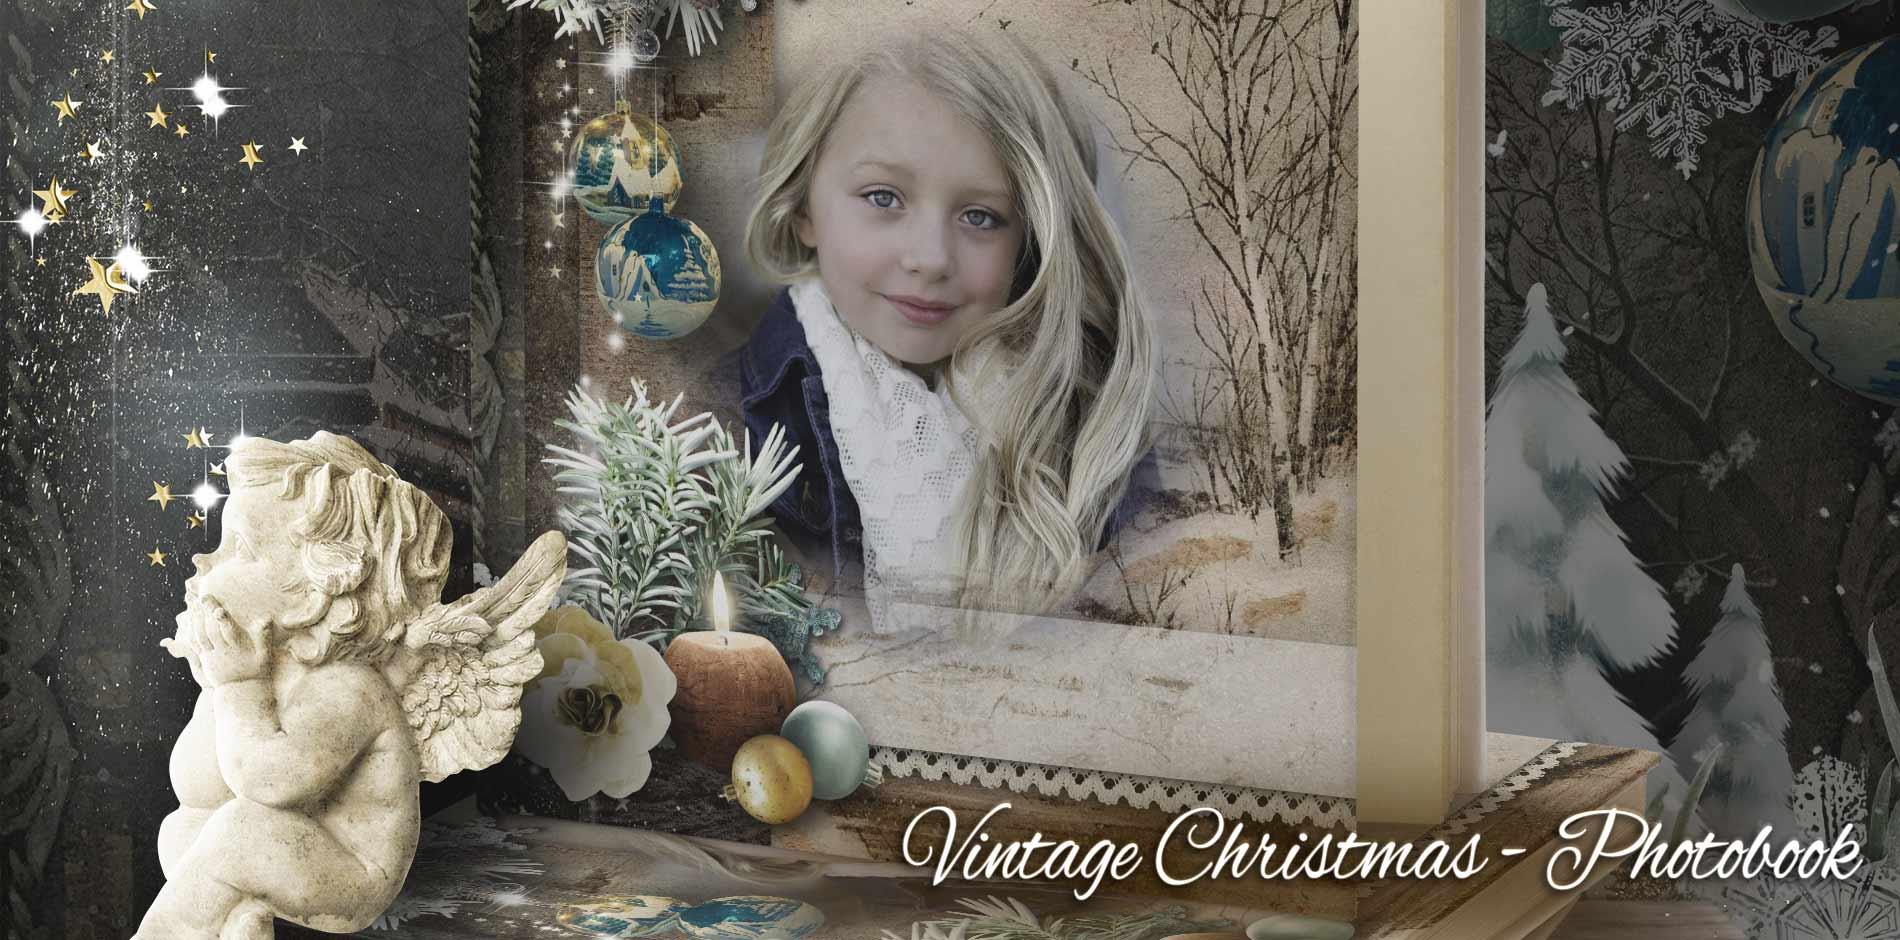 Vintage Christmas photobook - Header